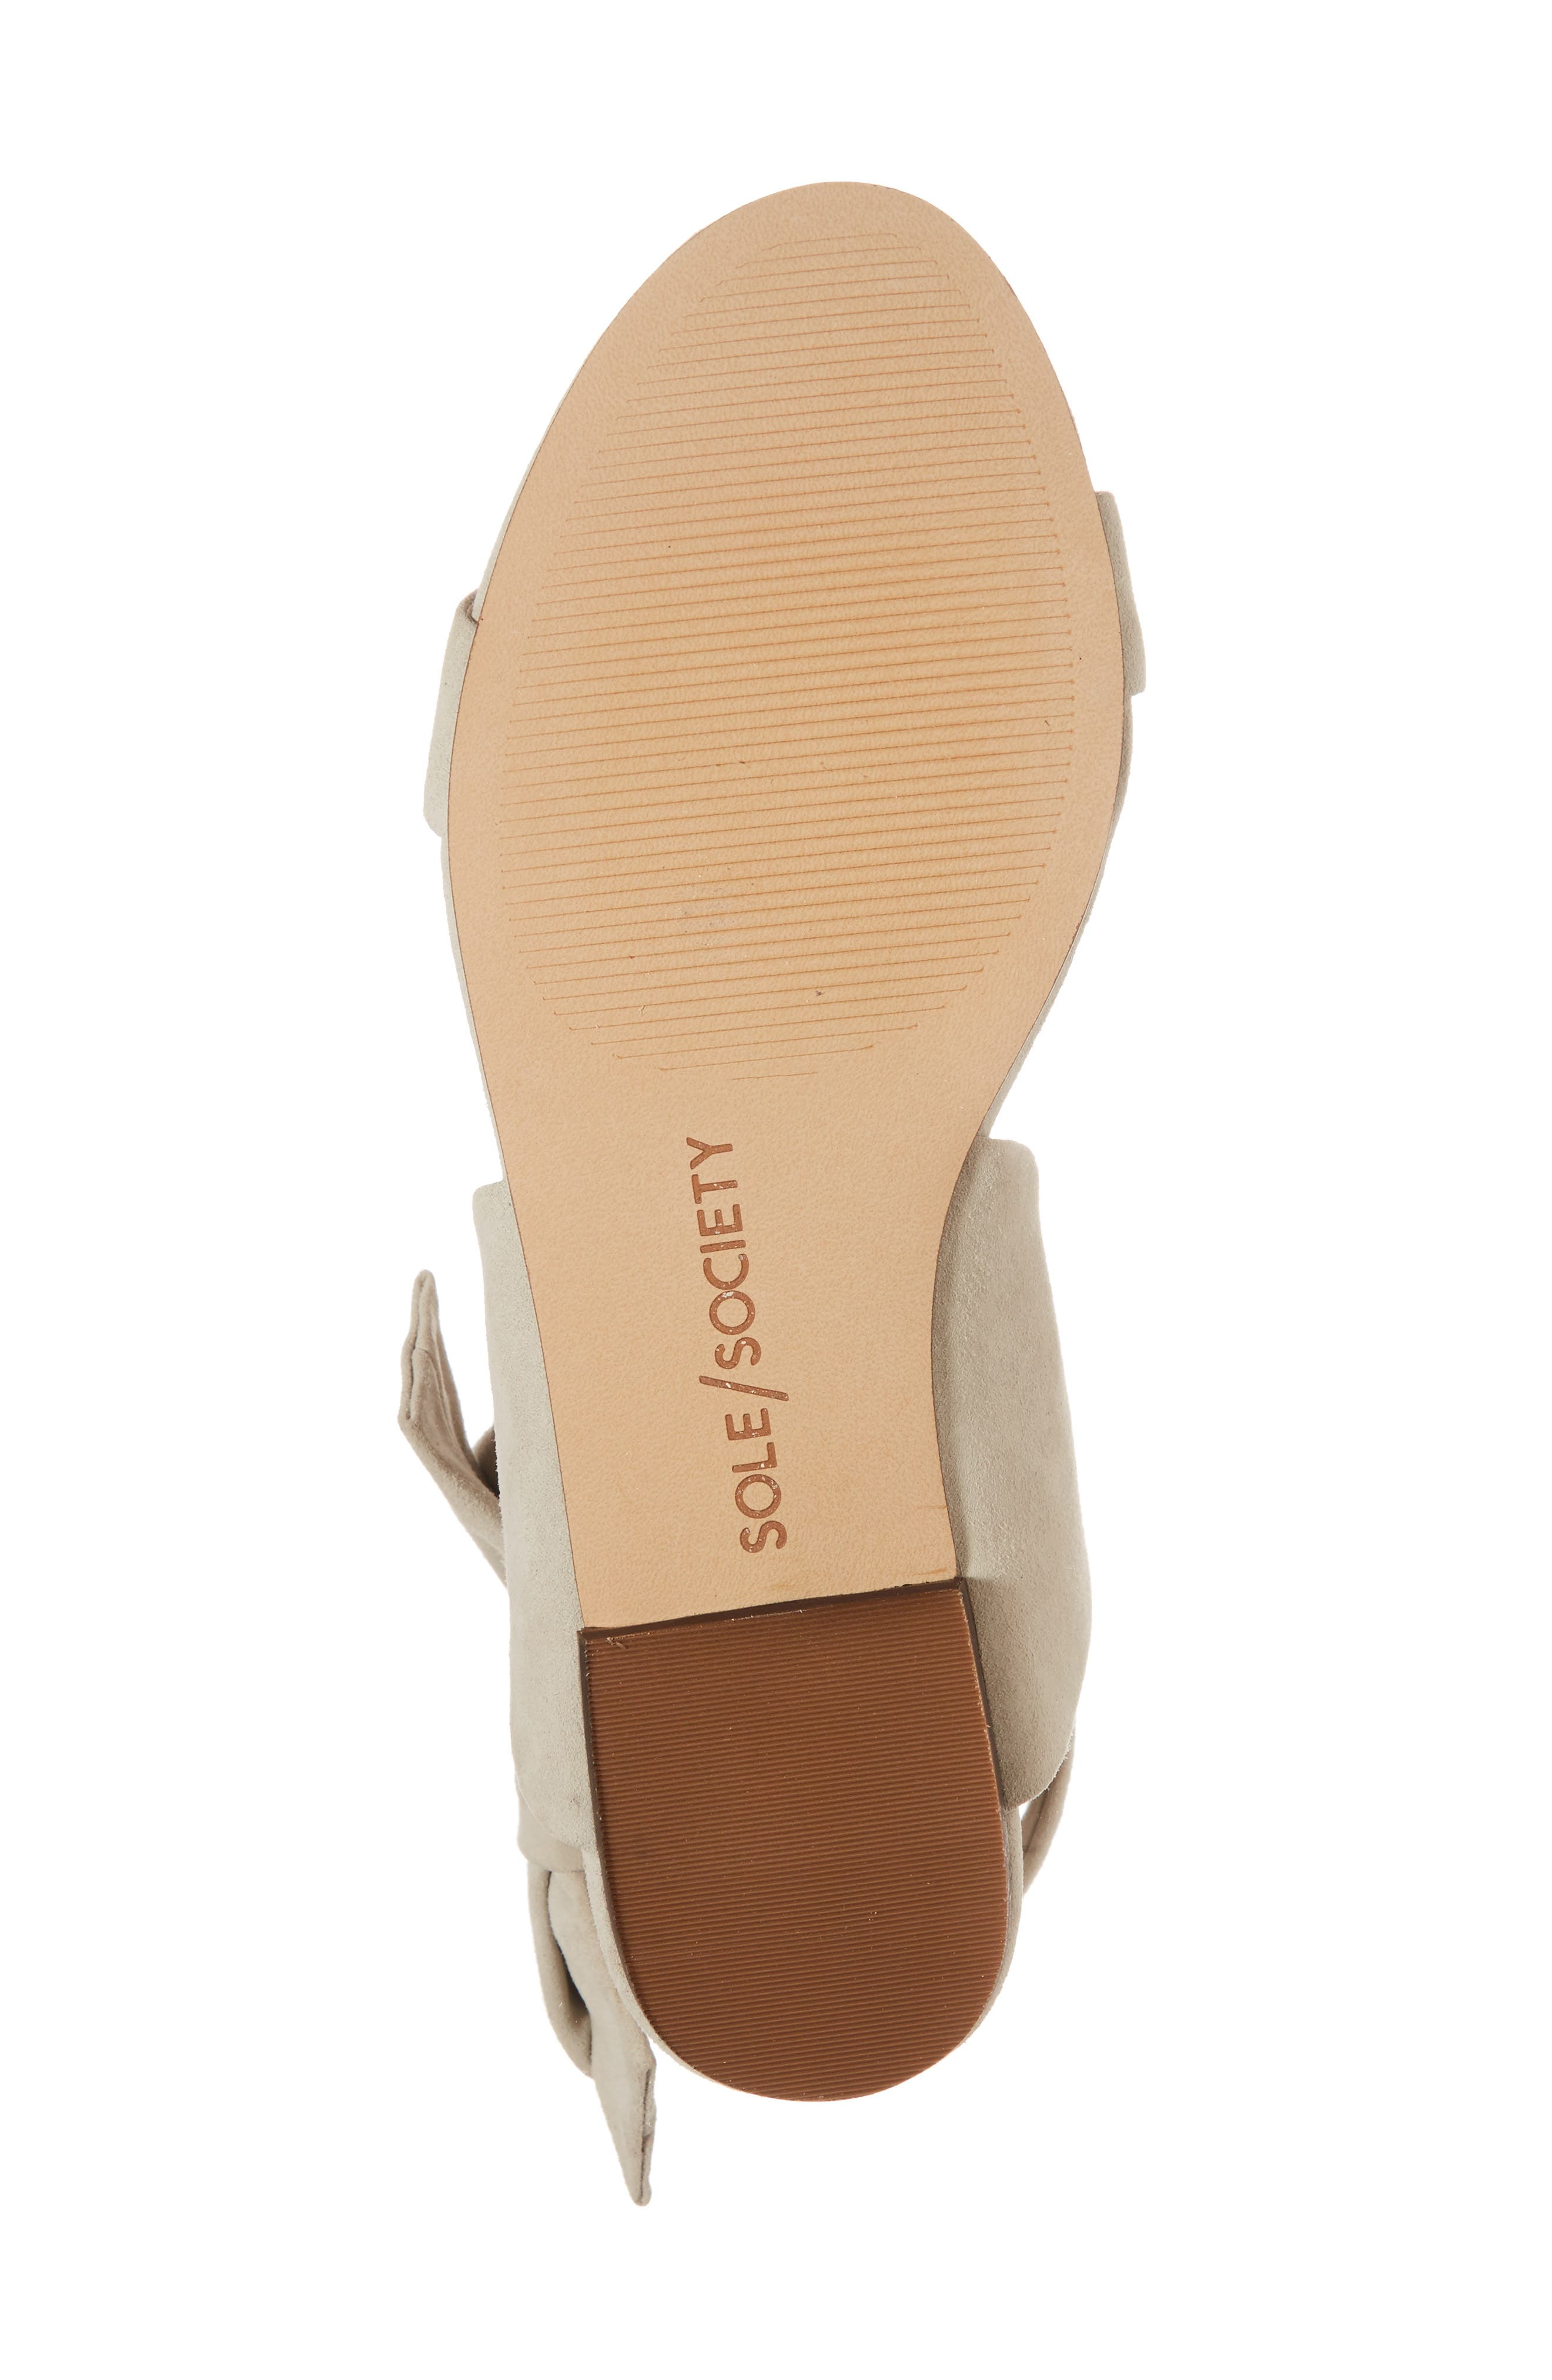 Calynda Bow Ankle Wrap Sandal,                             Alternate thumbnail 6, color,                             020